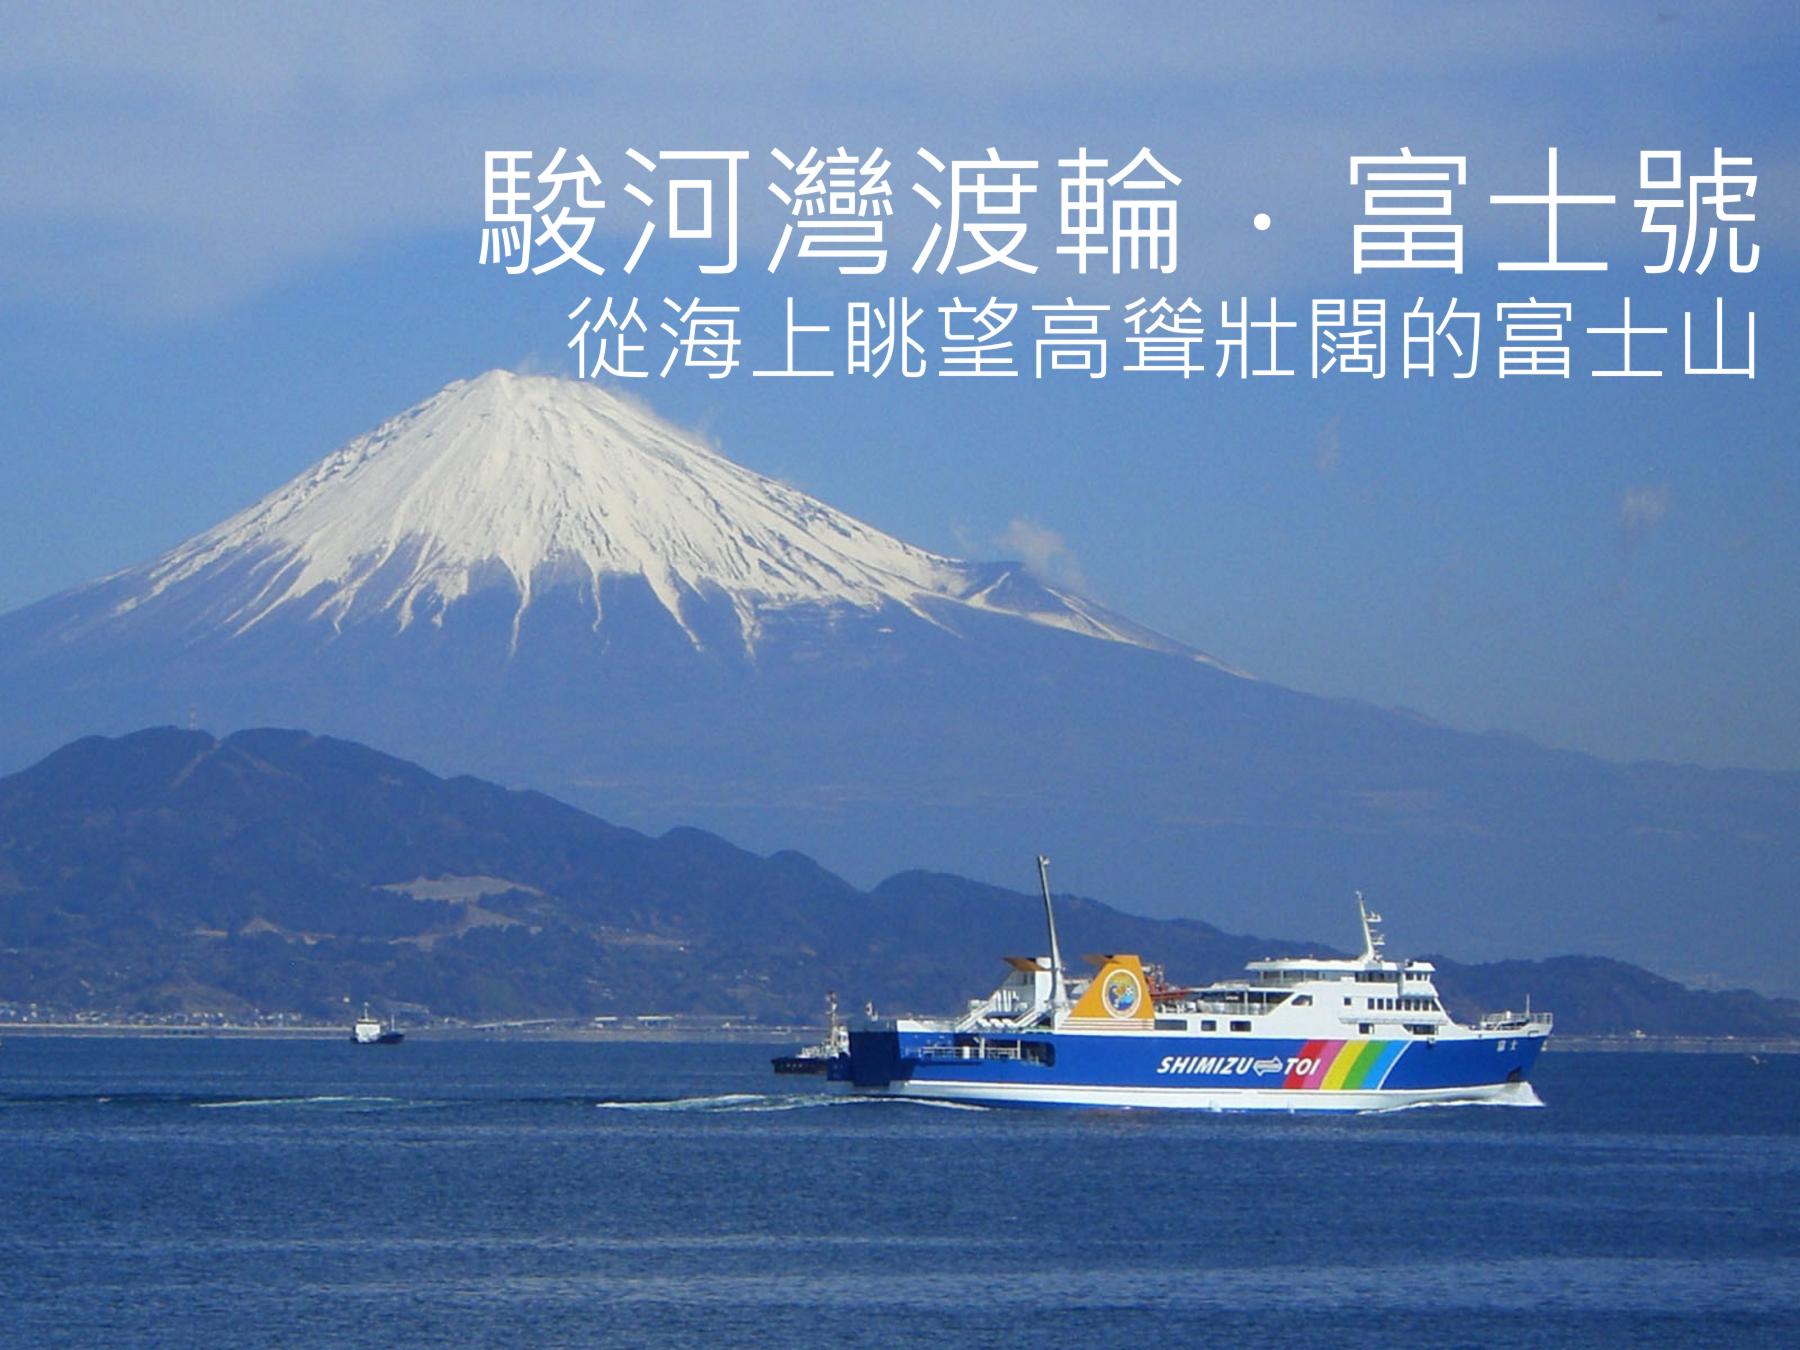 A06駿河灣